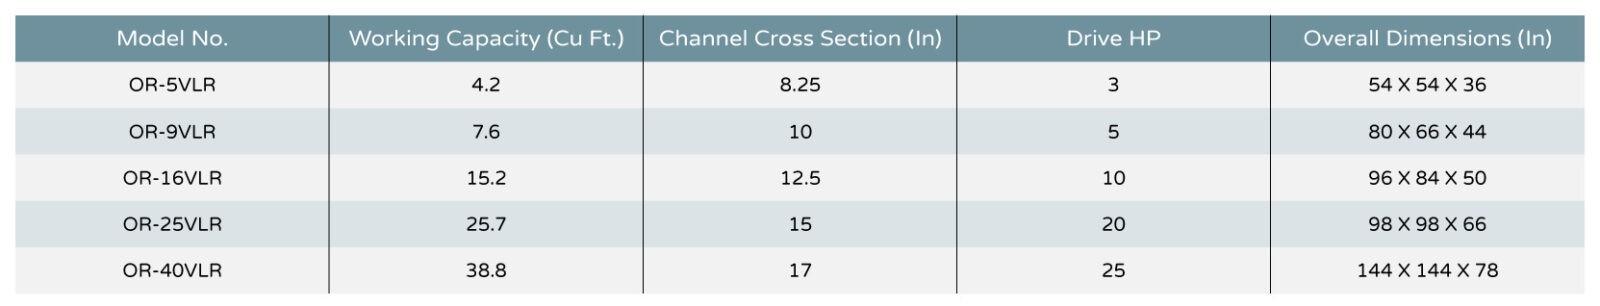 LR-Series Chart